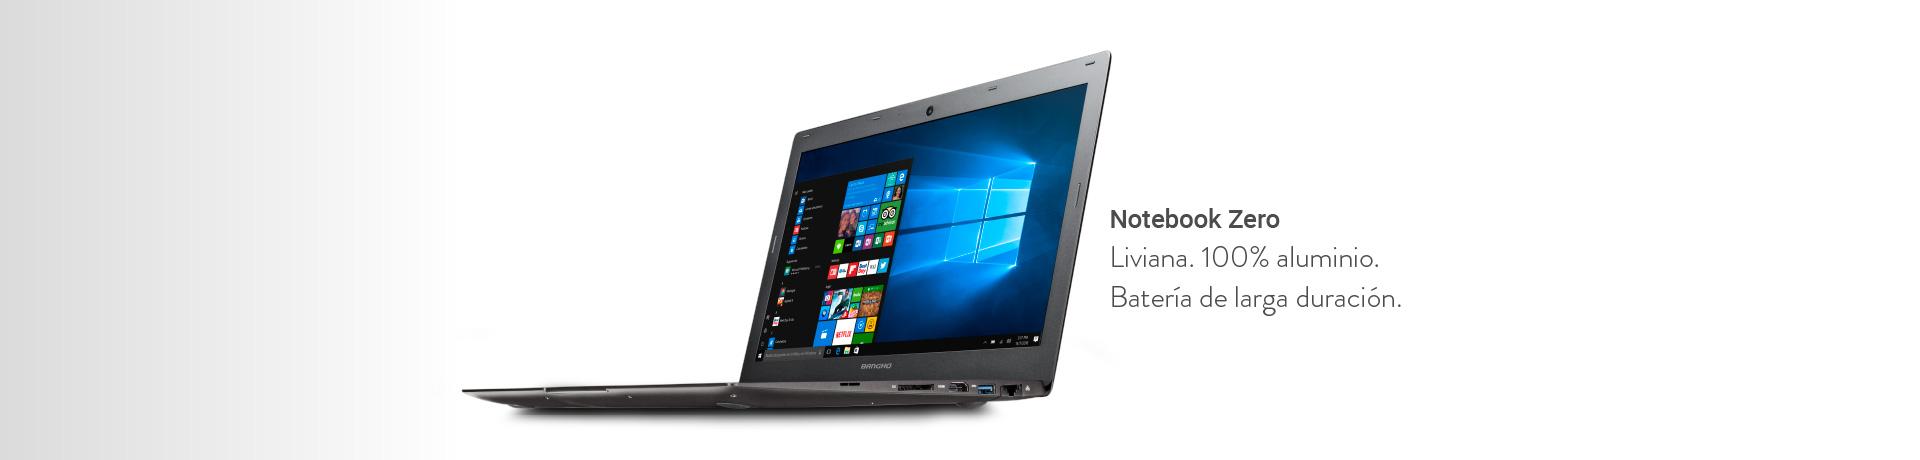 Grandes Empresas / Notebook Zero